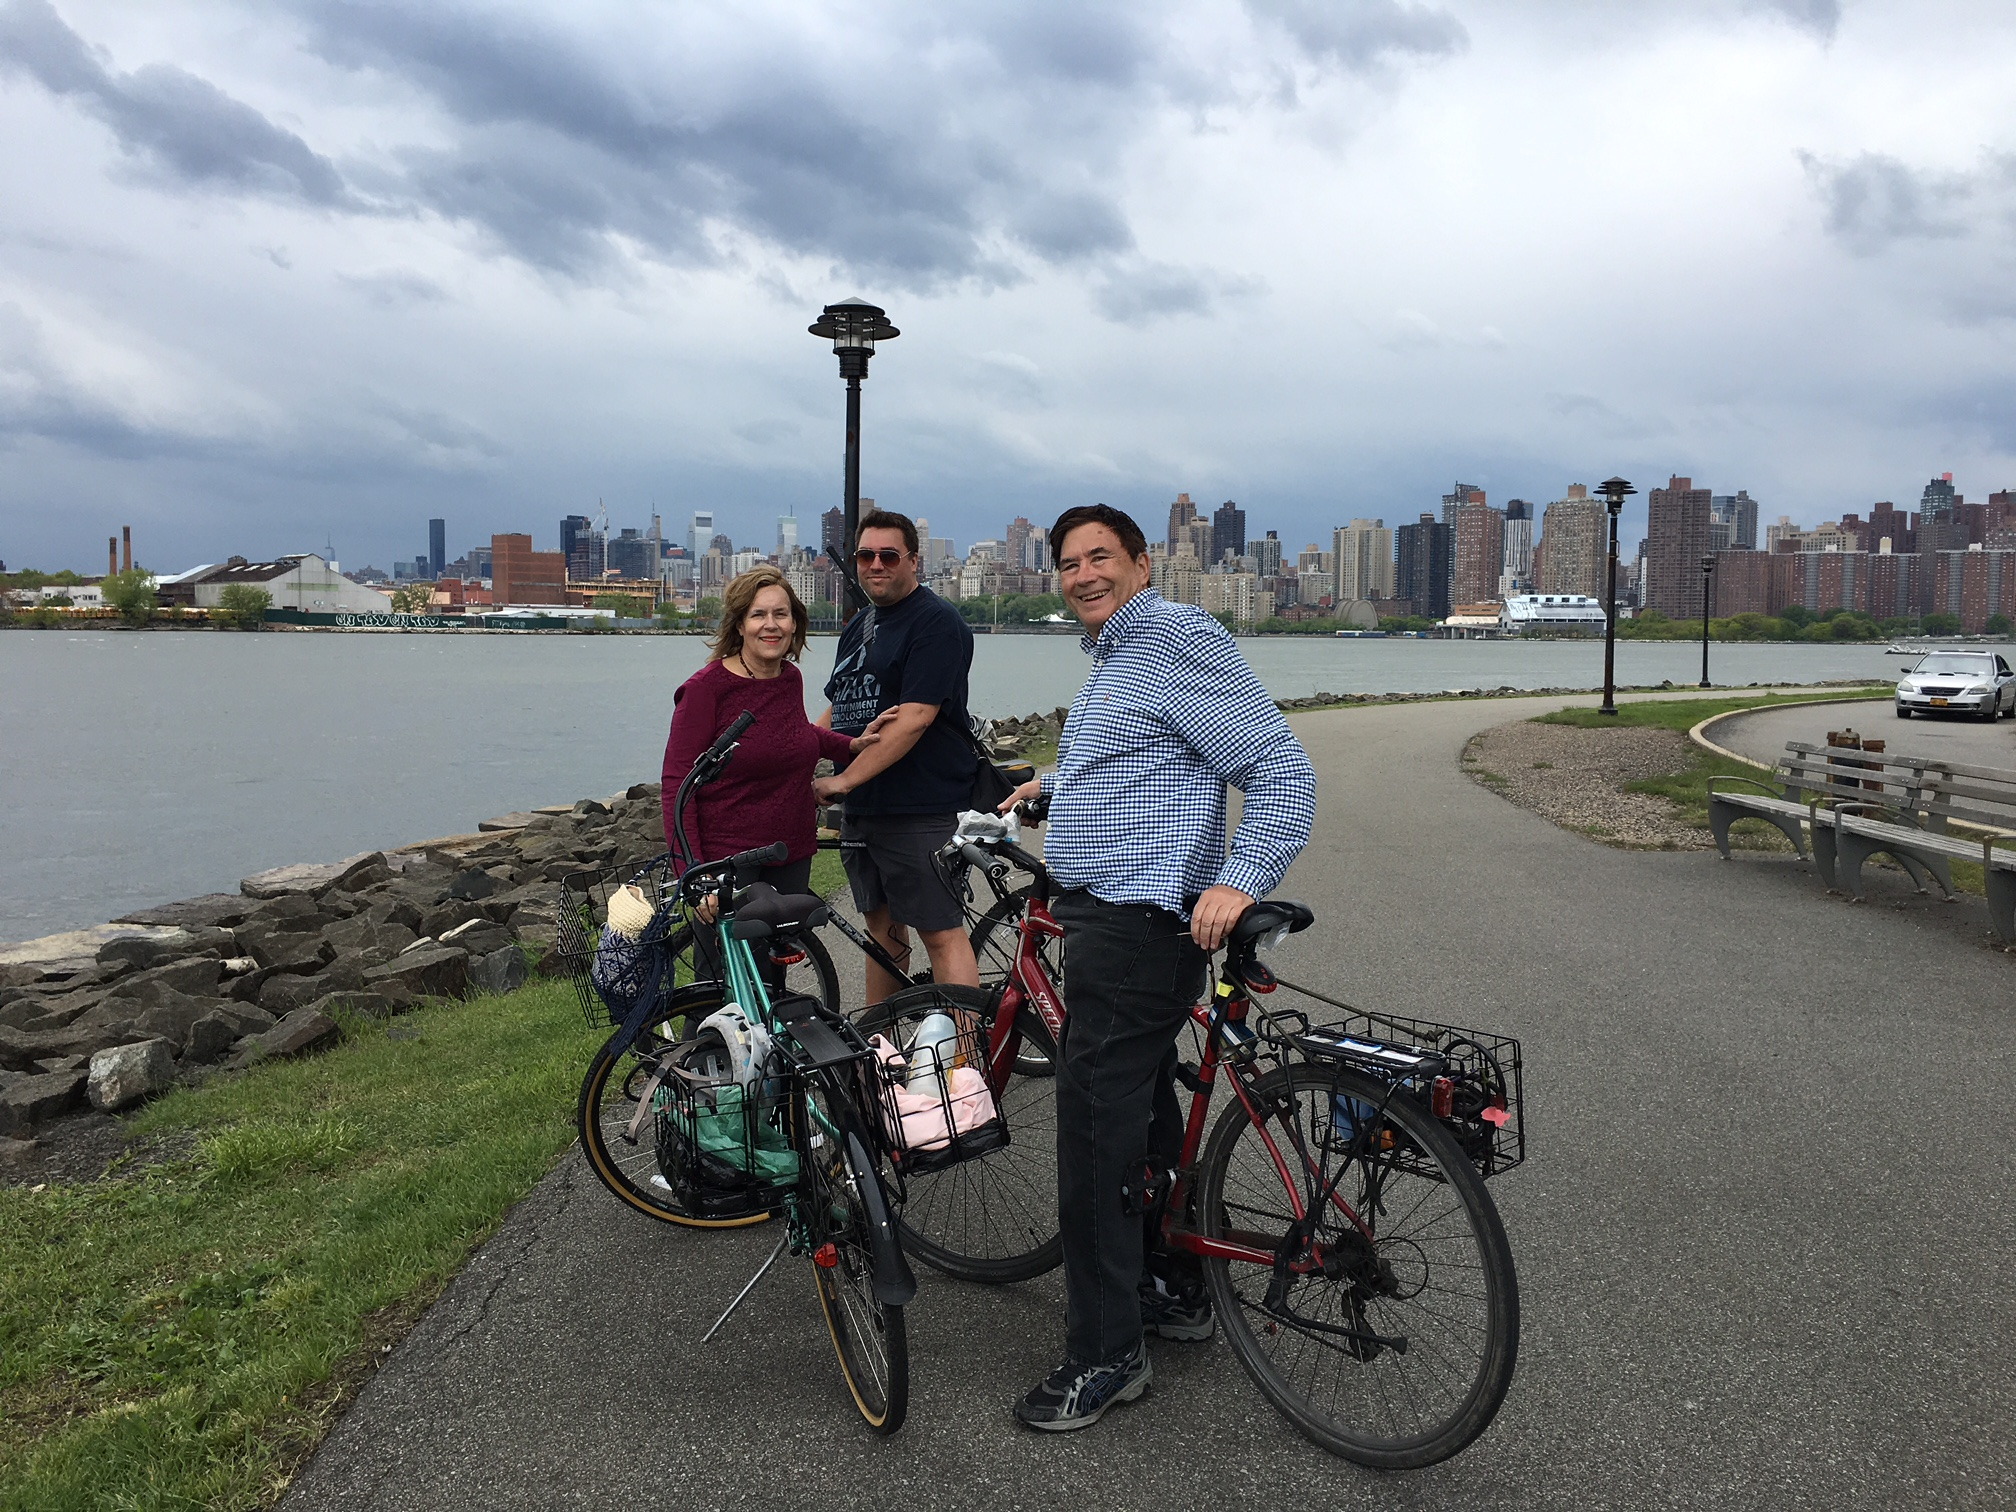 Lorraine, Greg & John, Mother's Day, May 14, 2017